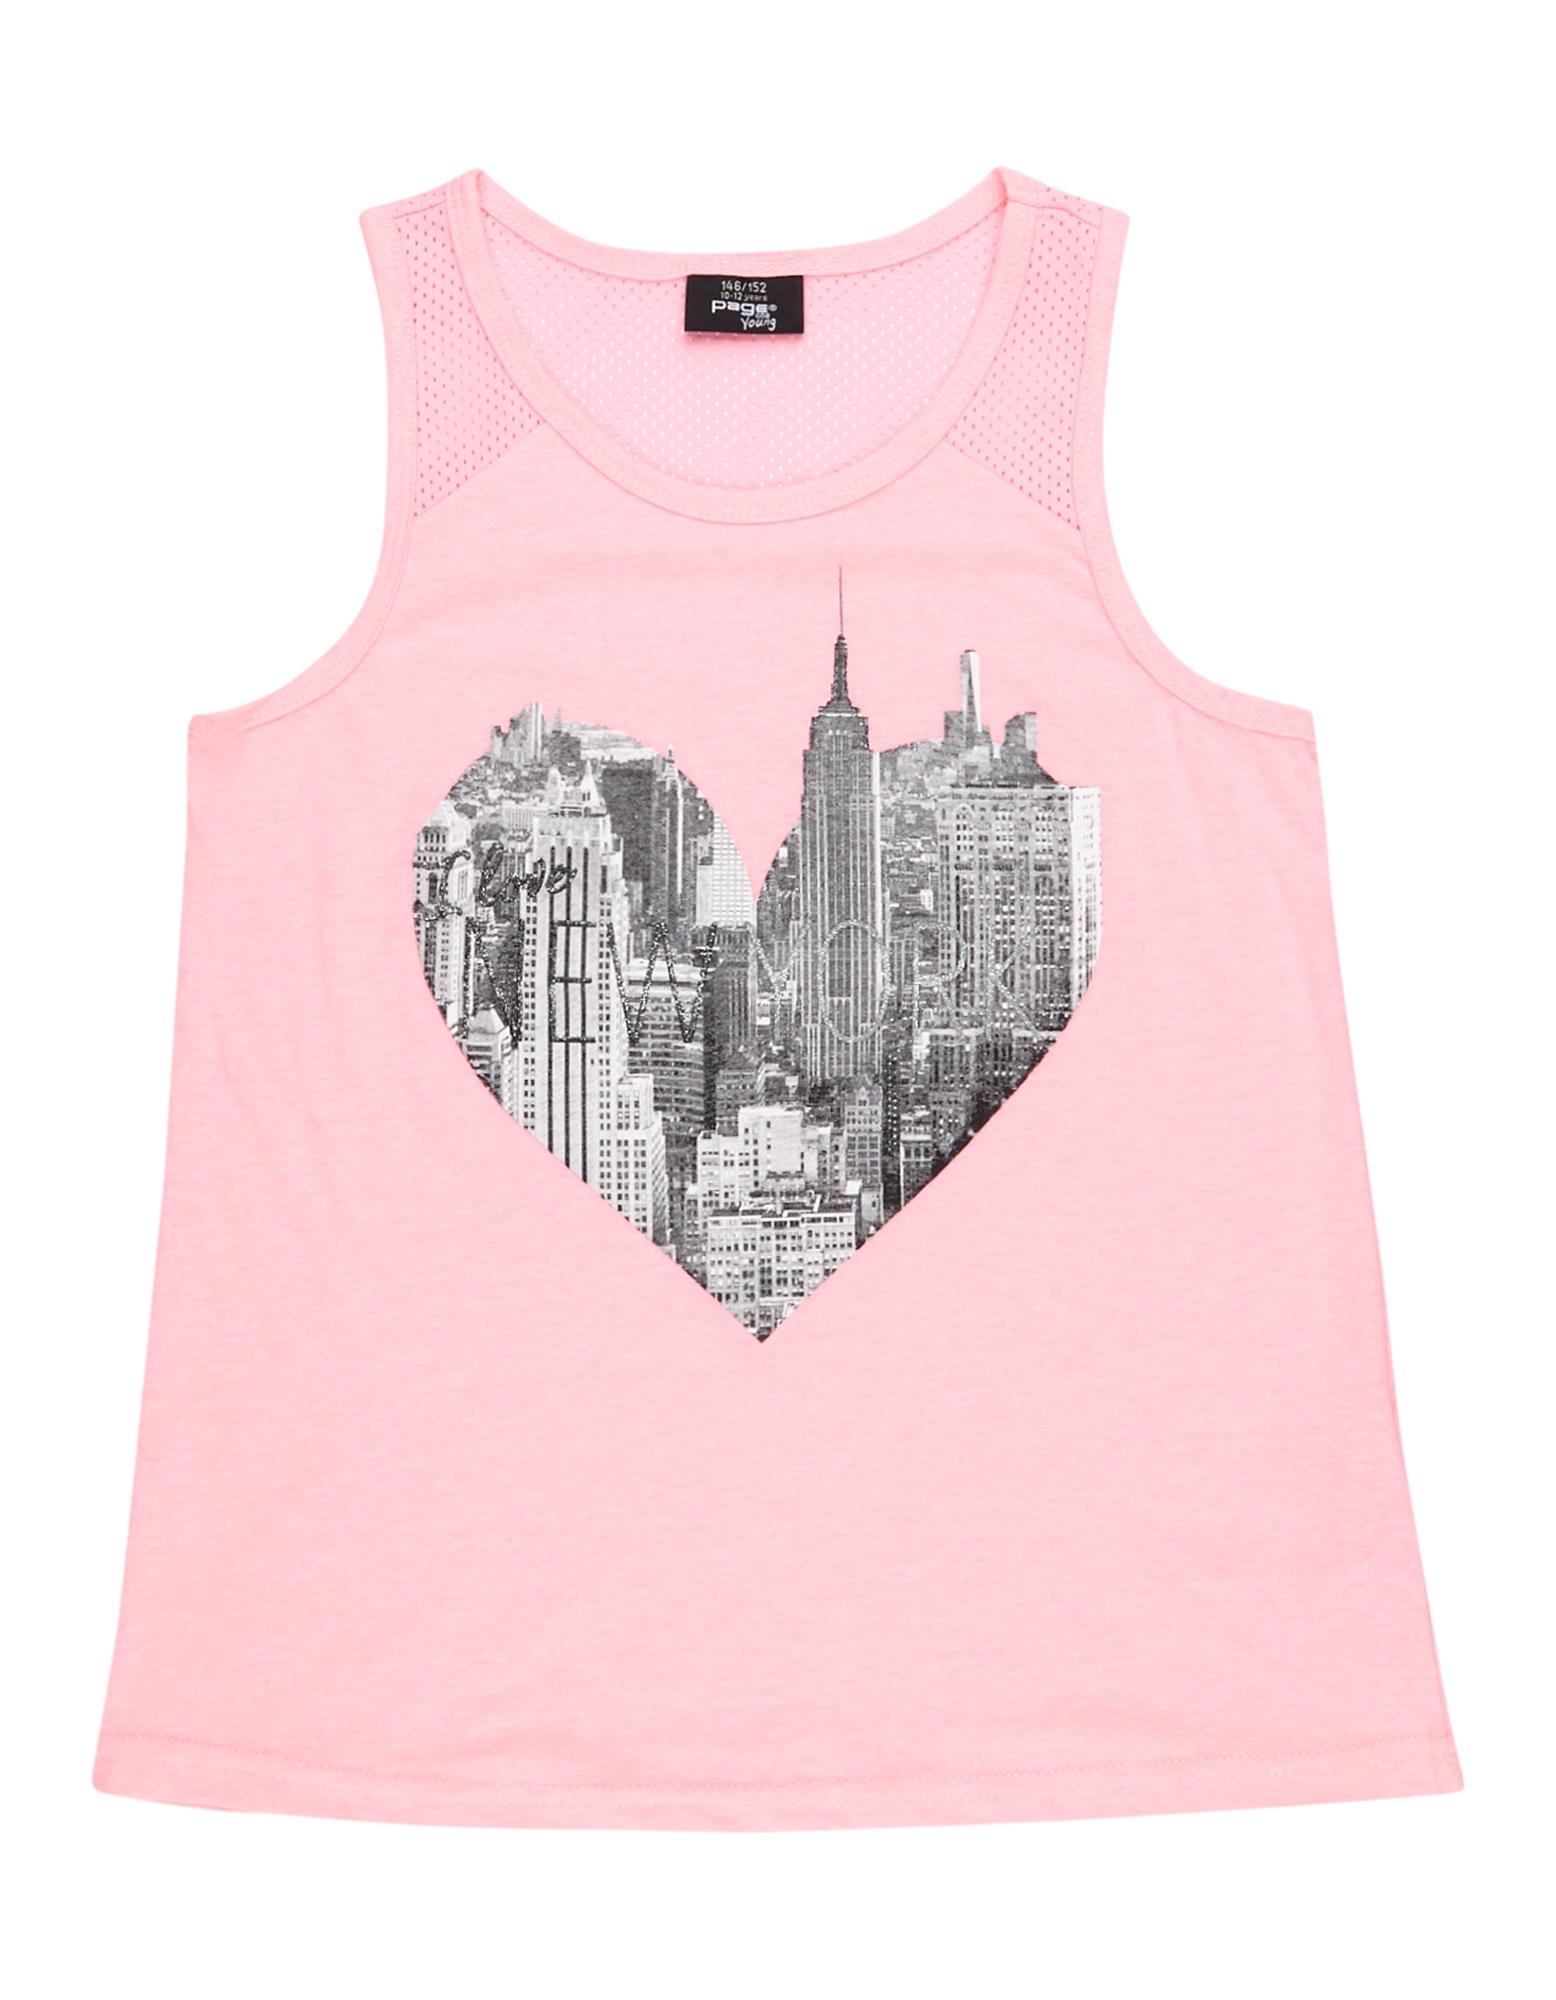 Mädchen Tanktop mit New York-Print  | 81495954350106